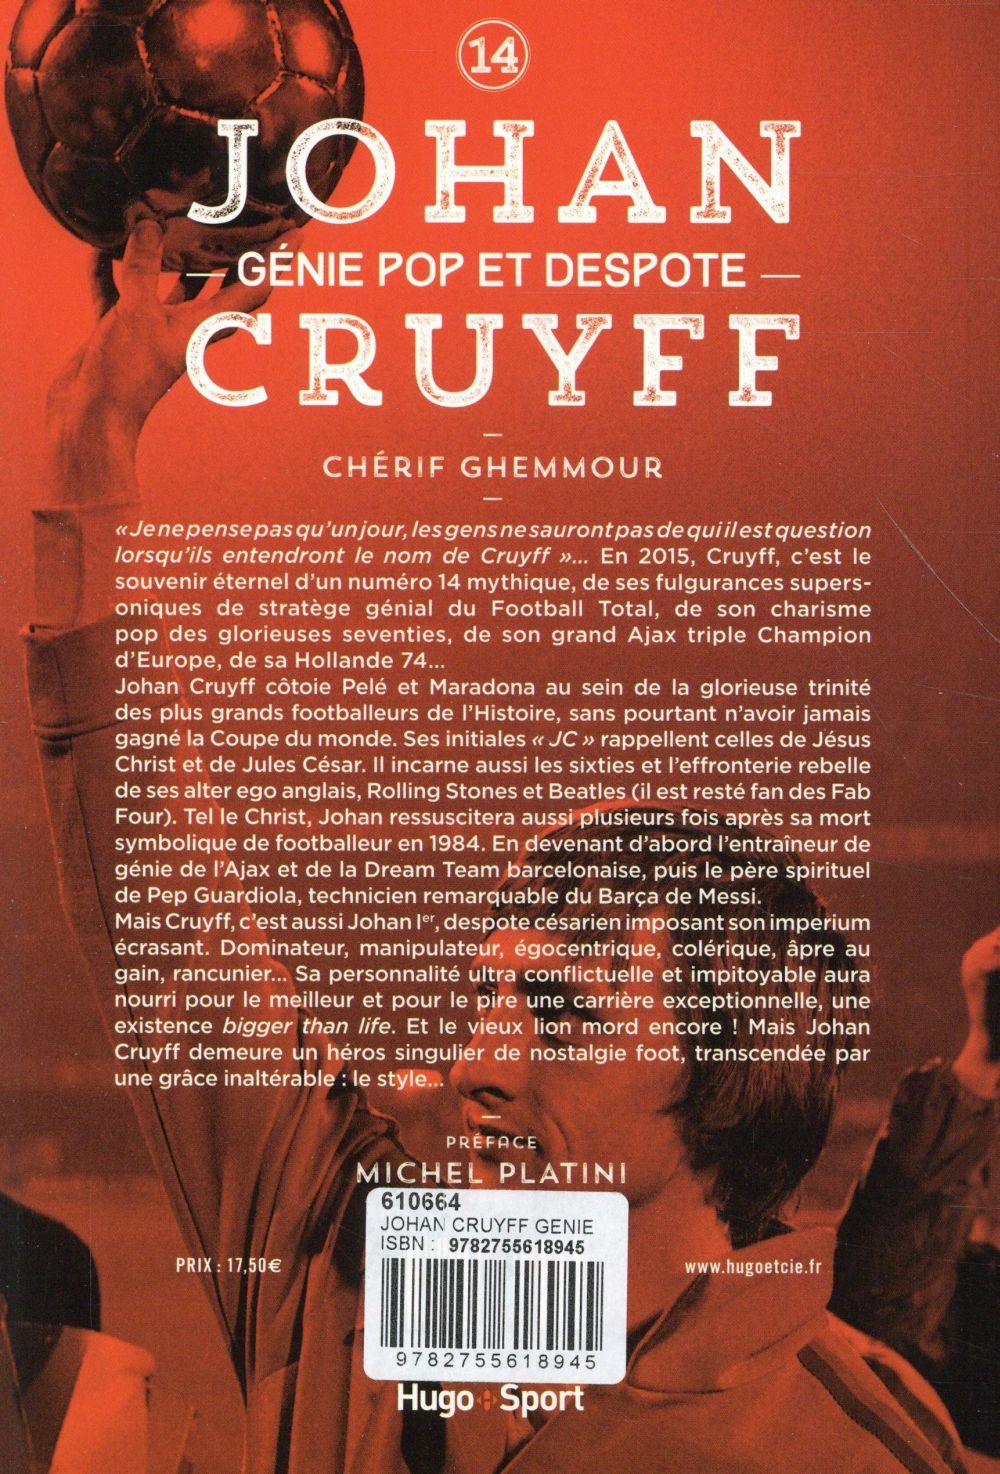 Johan Cruyff ; génie pop et despote